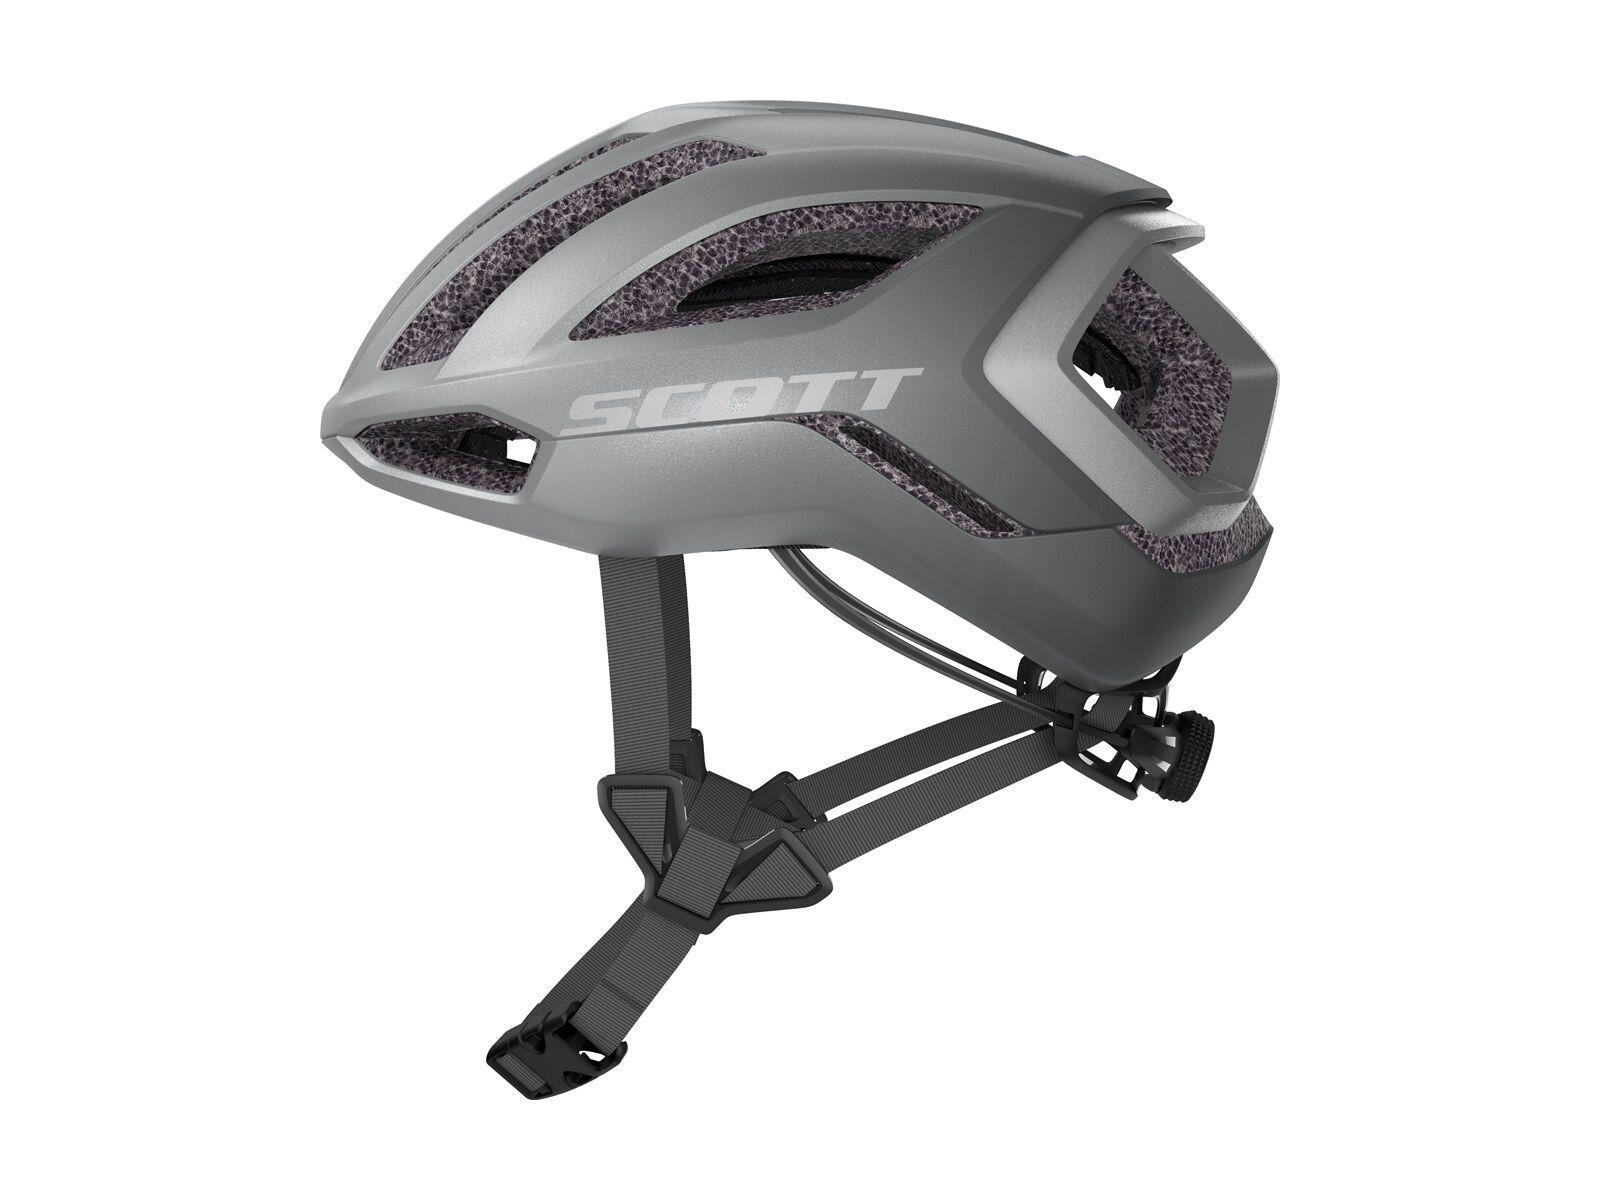 Scott Centric Plus Helmet, vogue silver/reflective | Bild 2